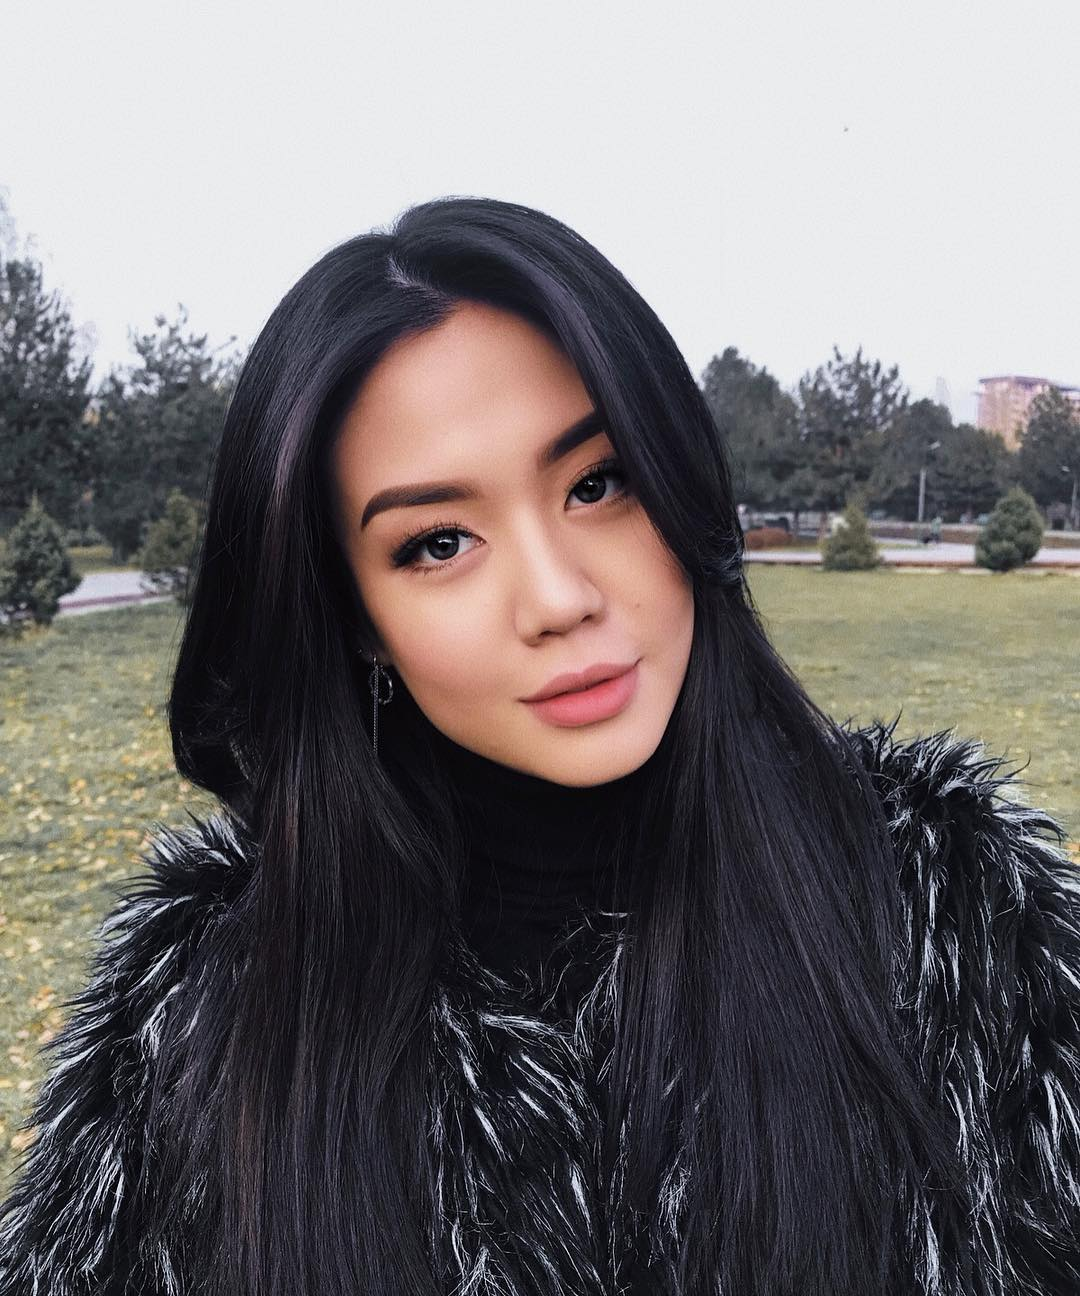 Айжан Асемова: биография Instagram блогерши